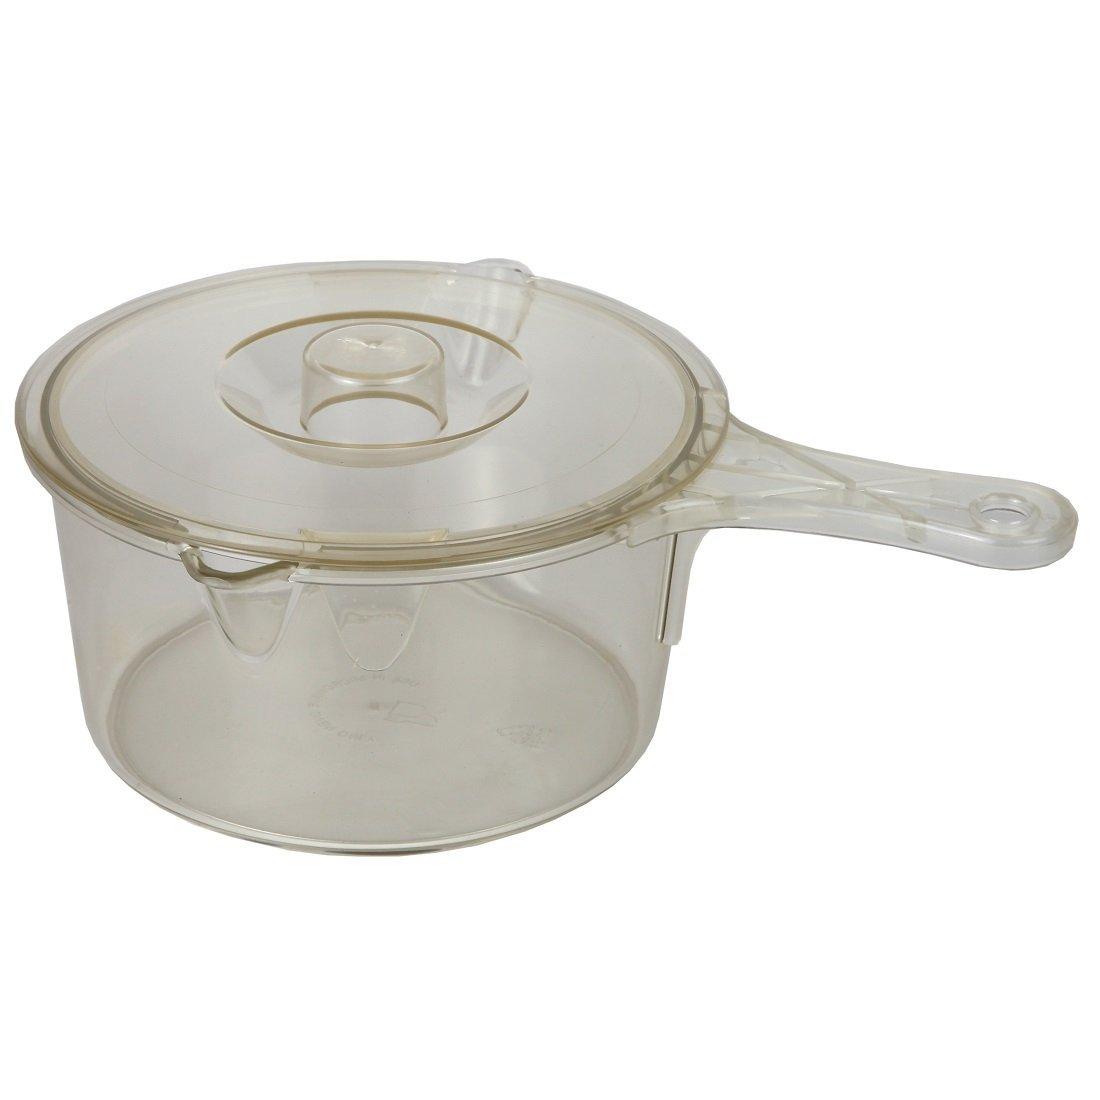 Home-X Microwave Sauce Pan with Lid